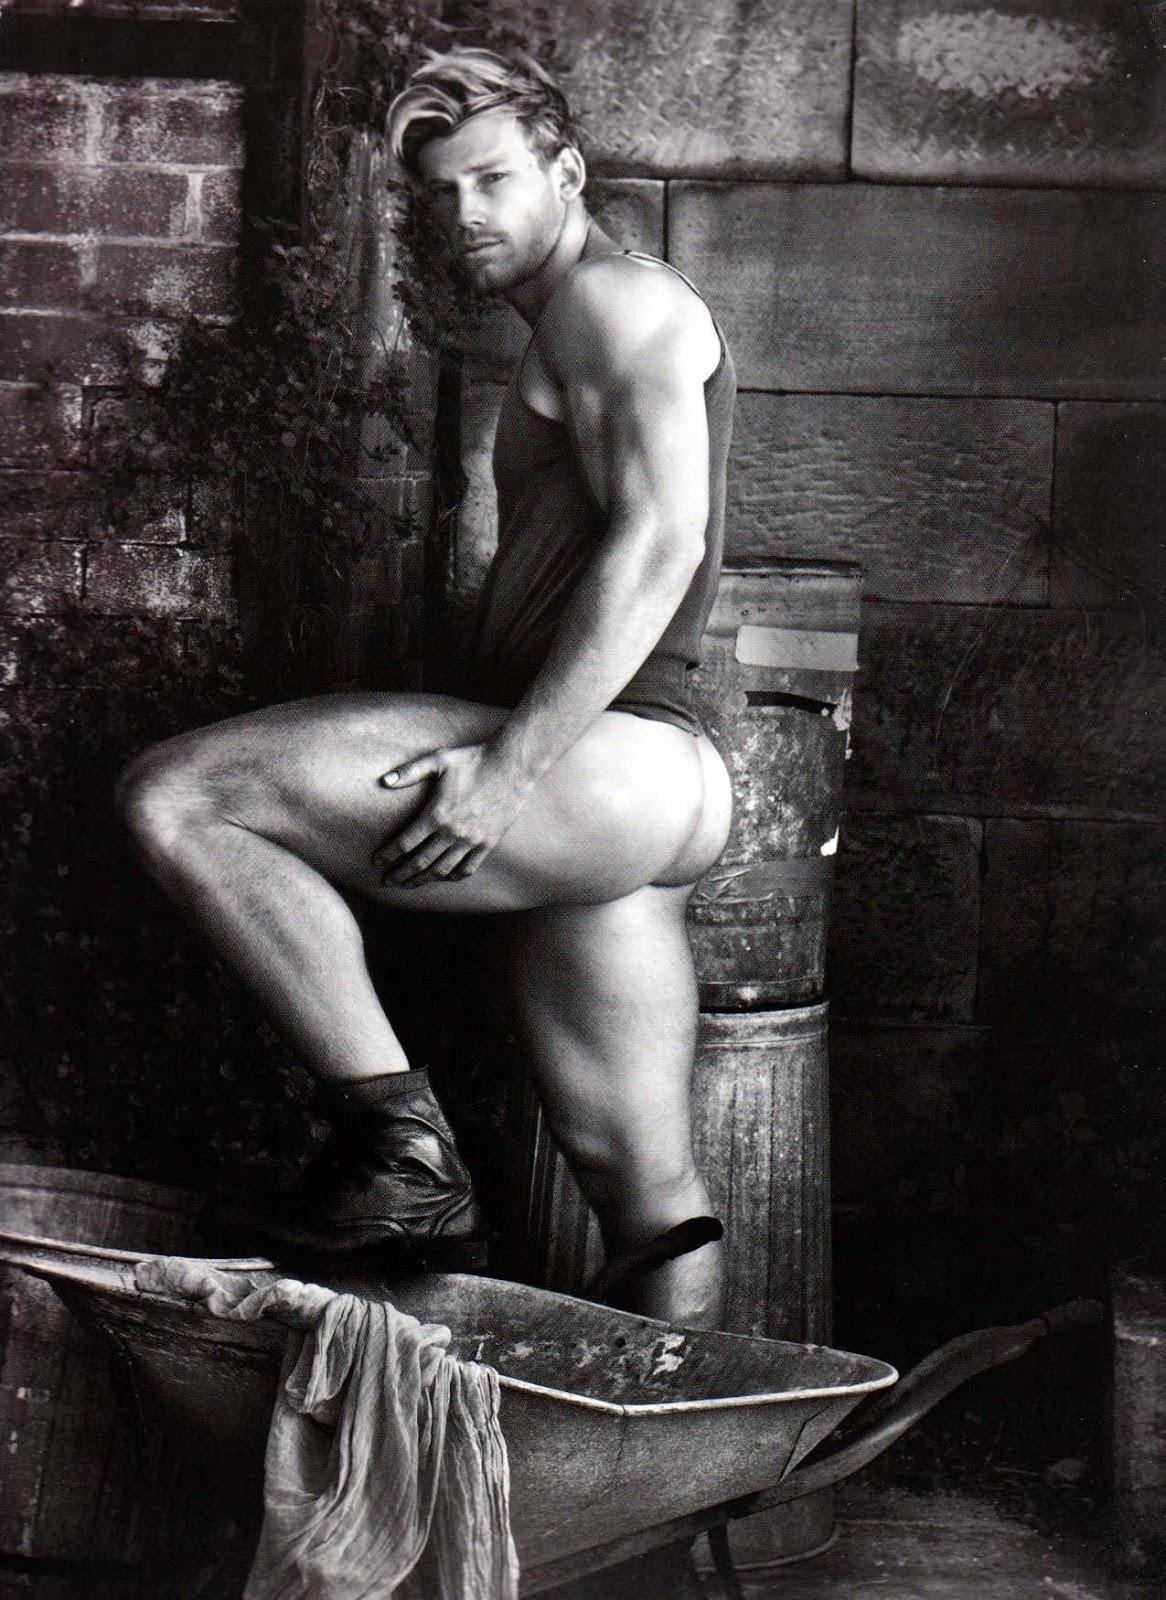 Best male nudes in art history